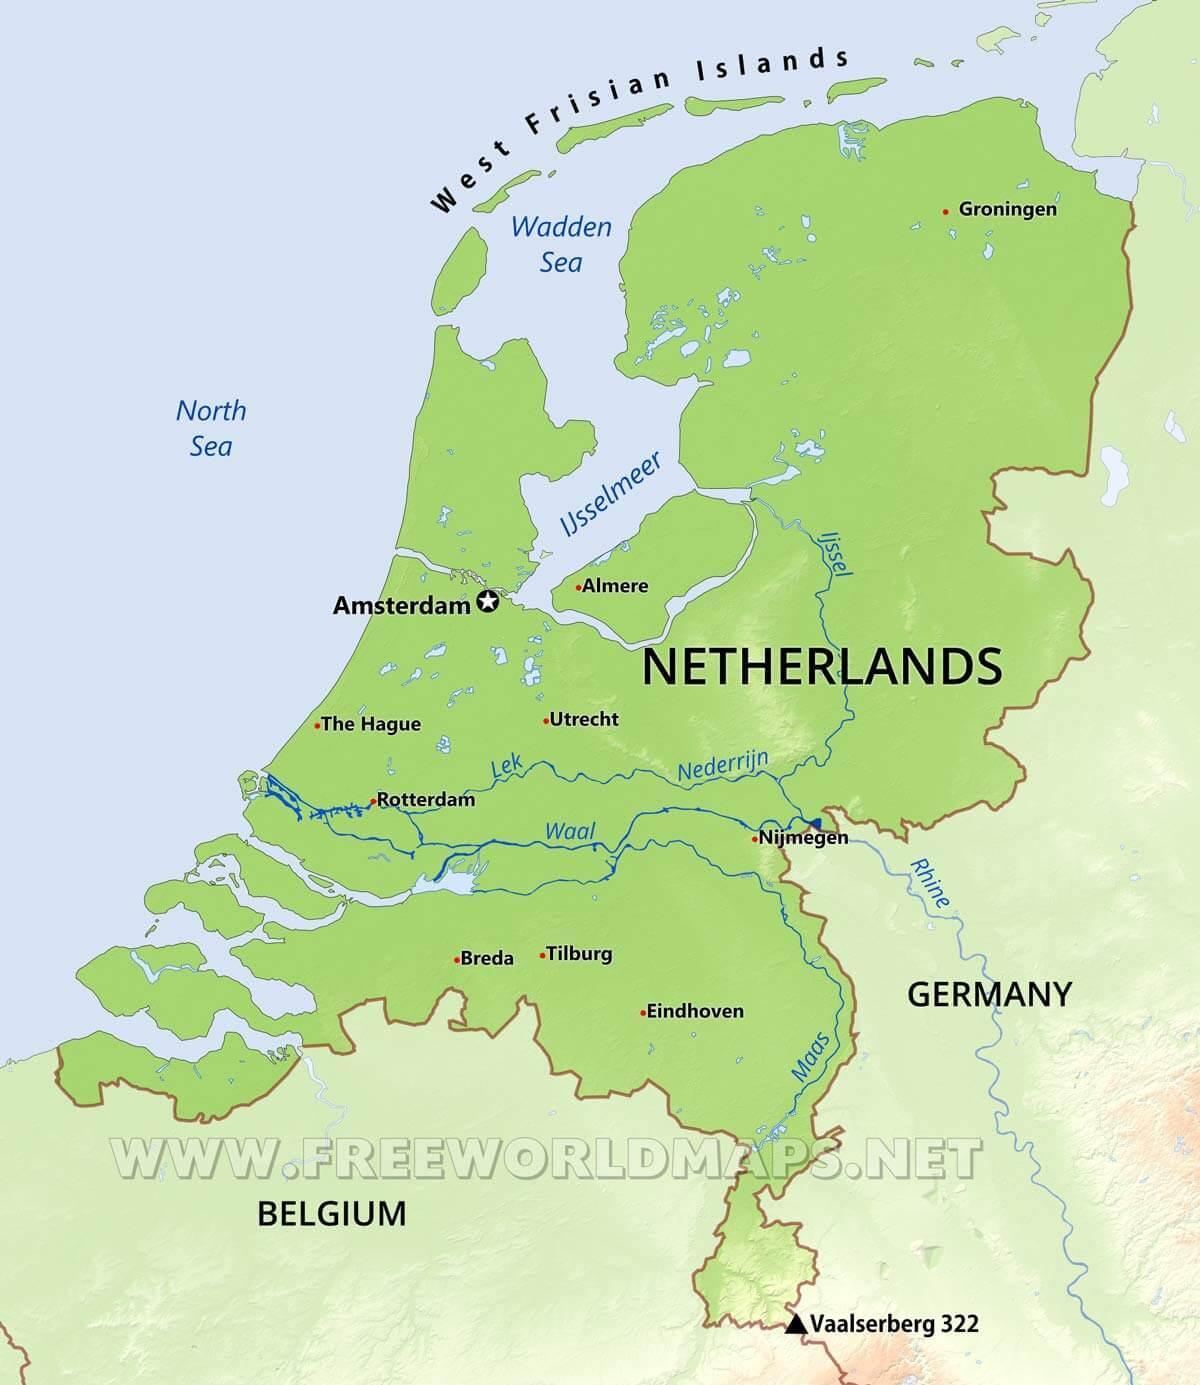 Niederlande Ijsselmeer Karte.Niederlande Geographie Landkarte Holland Geografischen Karte